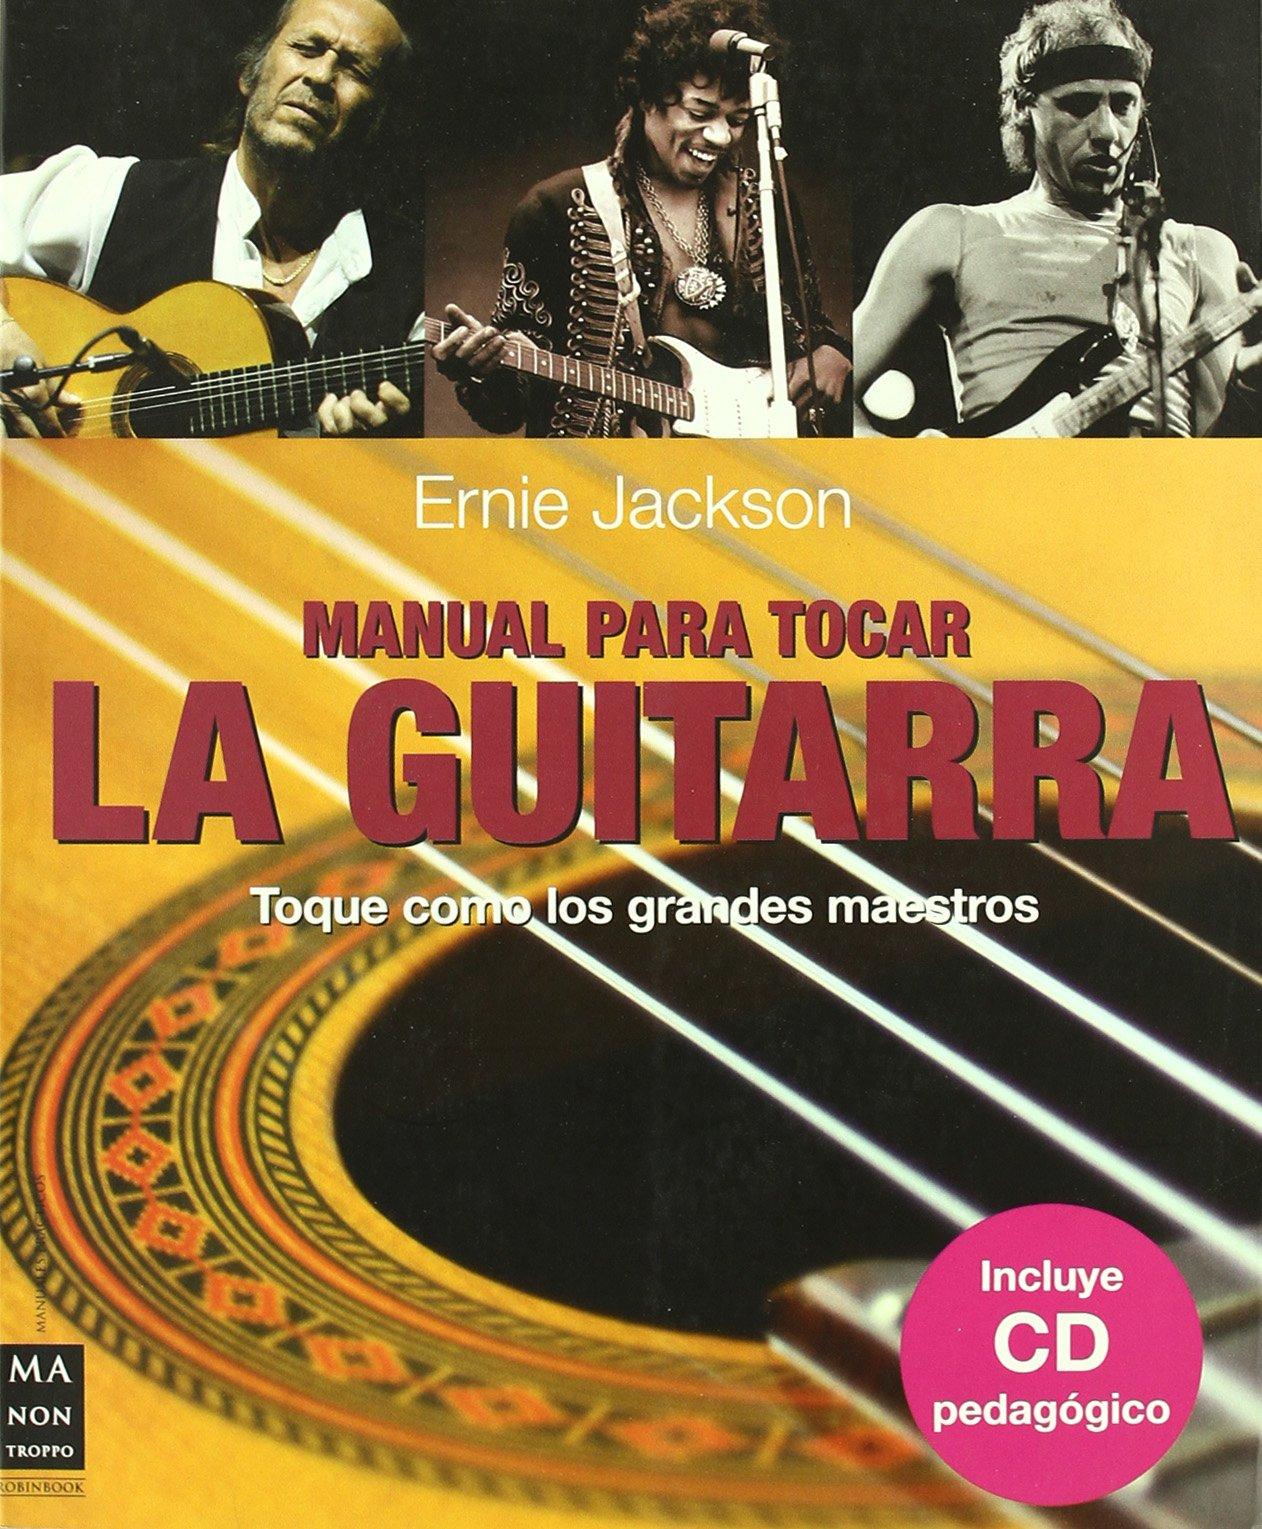 Manual para tocar la guitarra: Ernie Jackson: 9788496924178: Amazon.com: Books